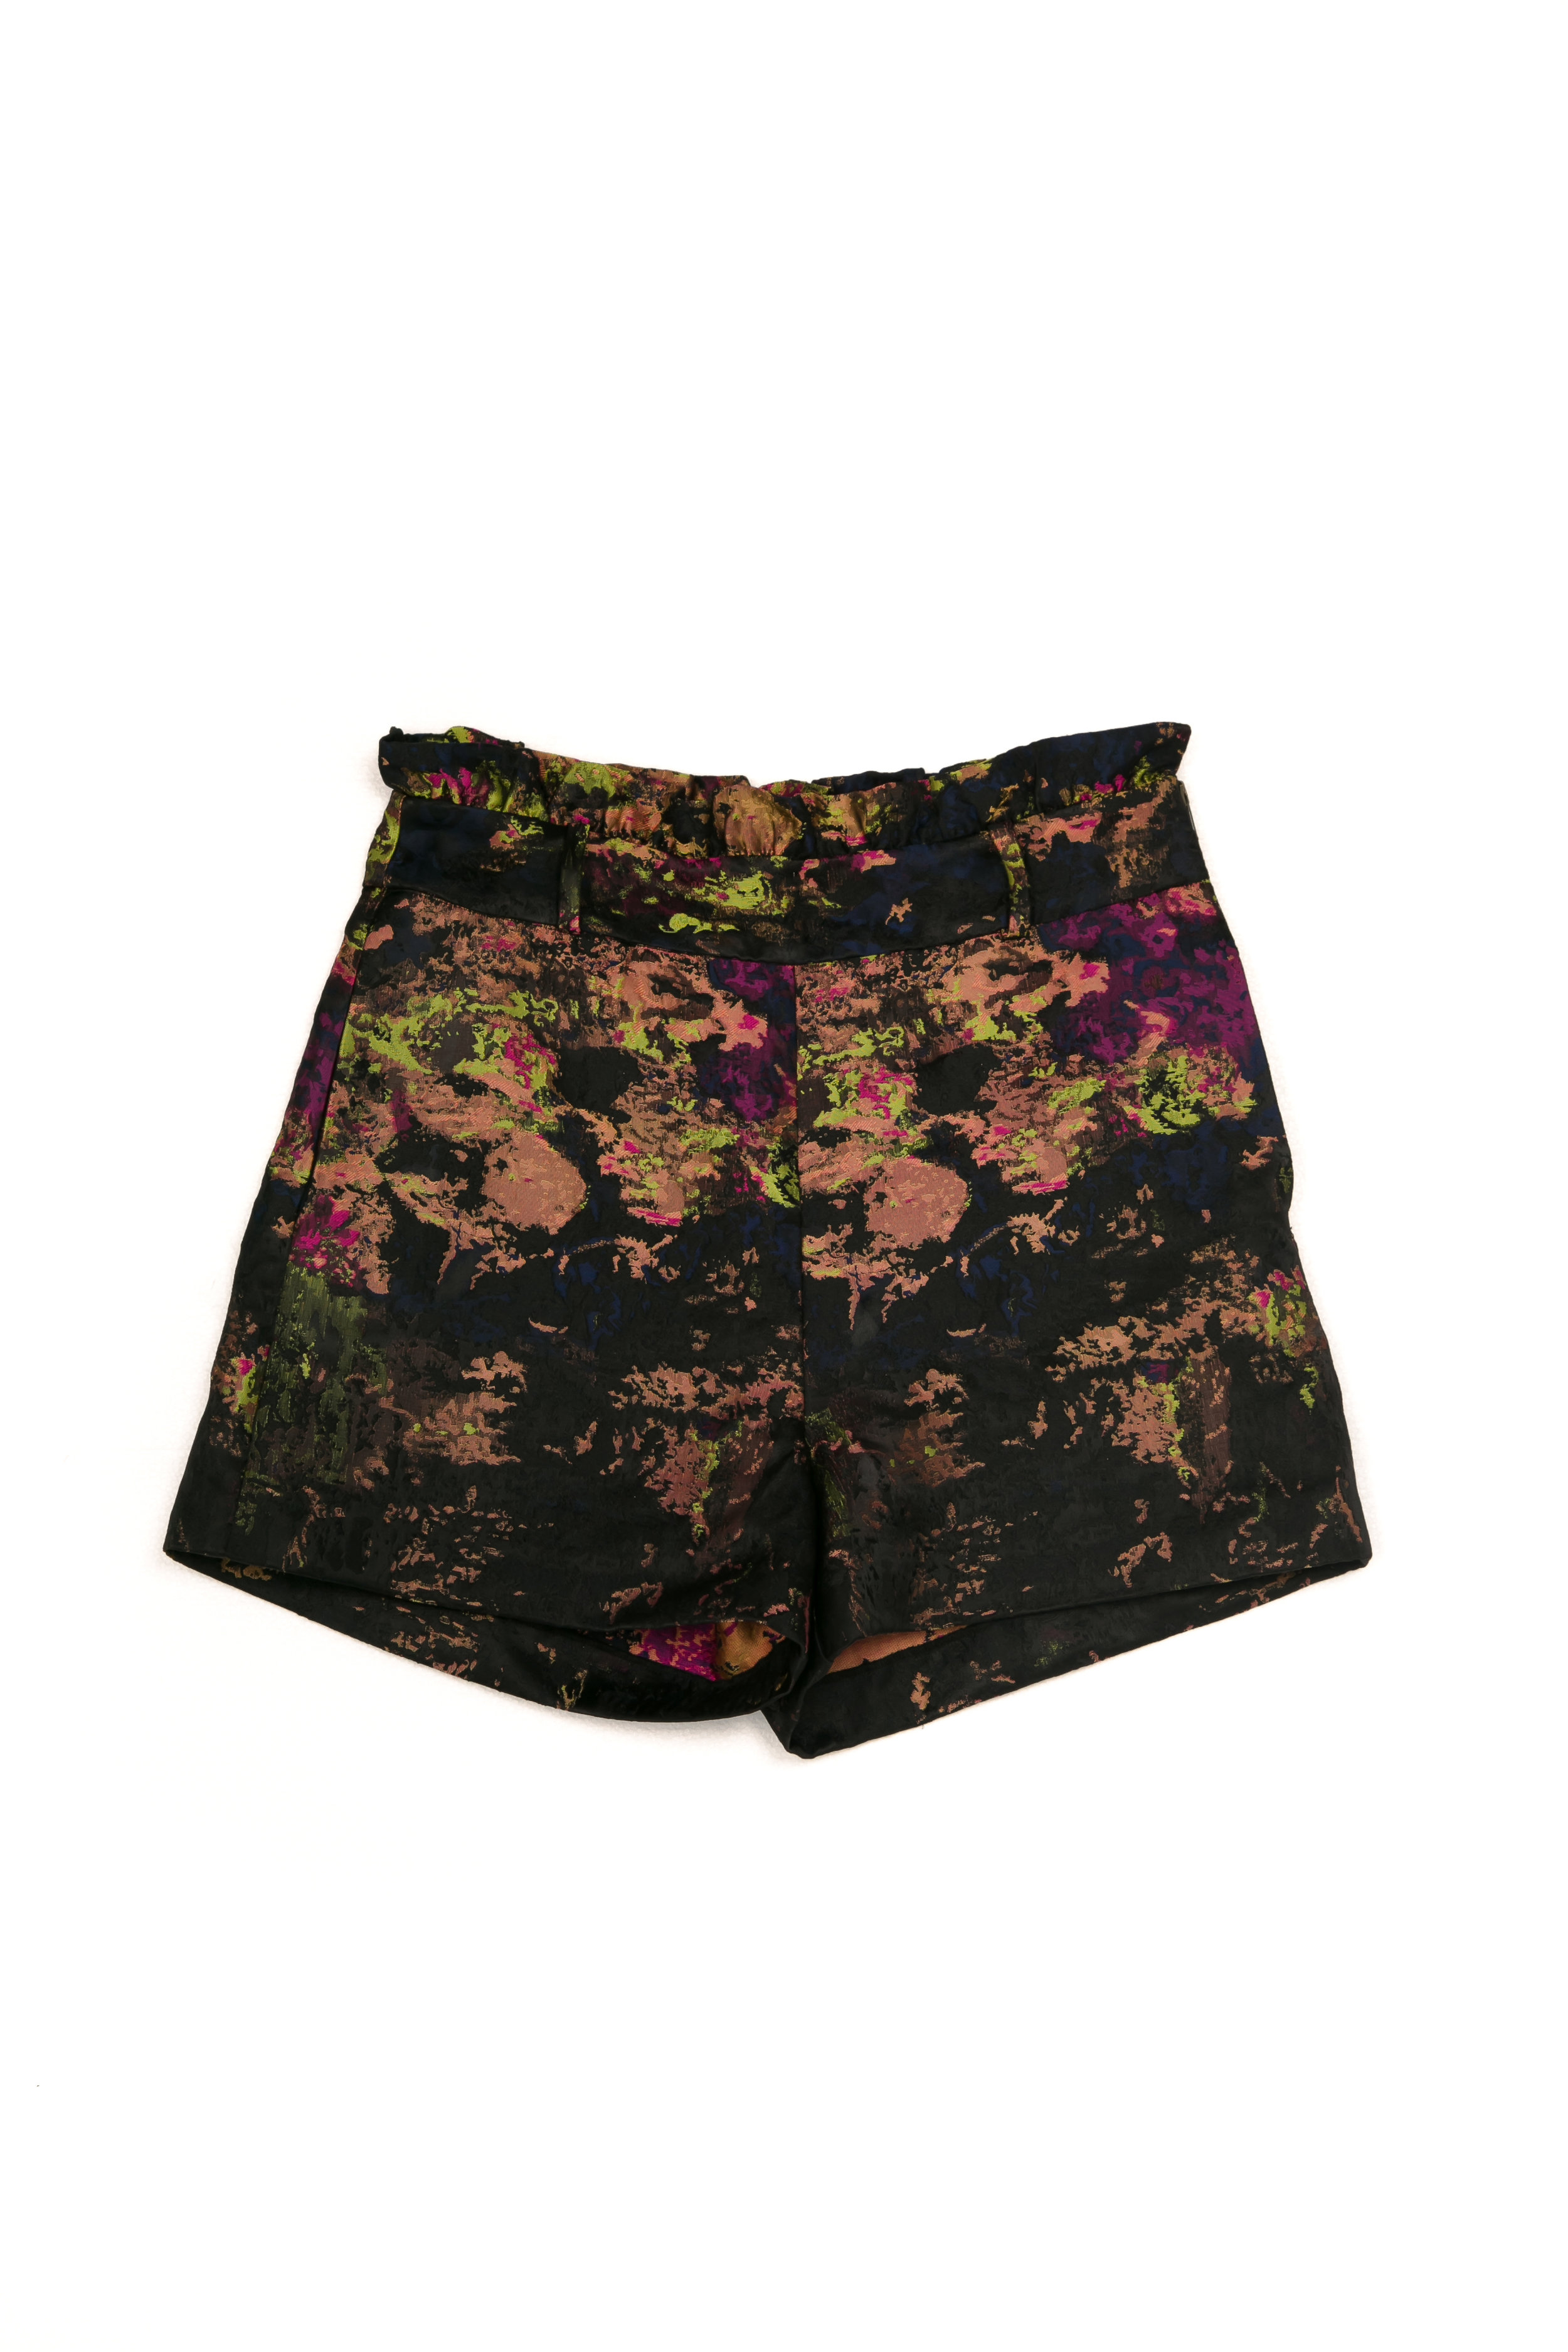 TIMIC shorts